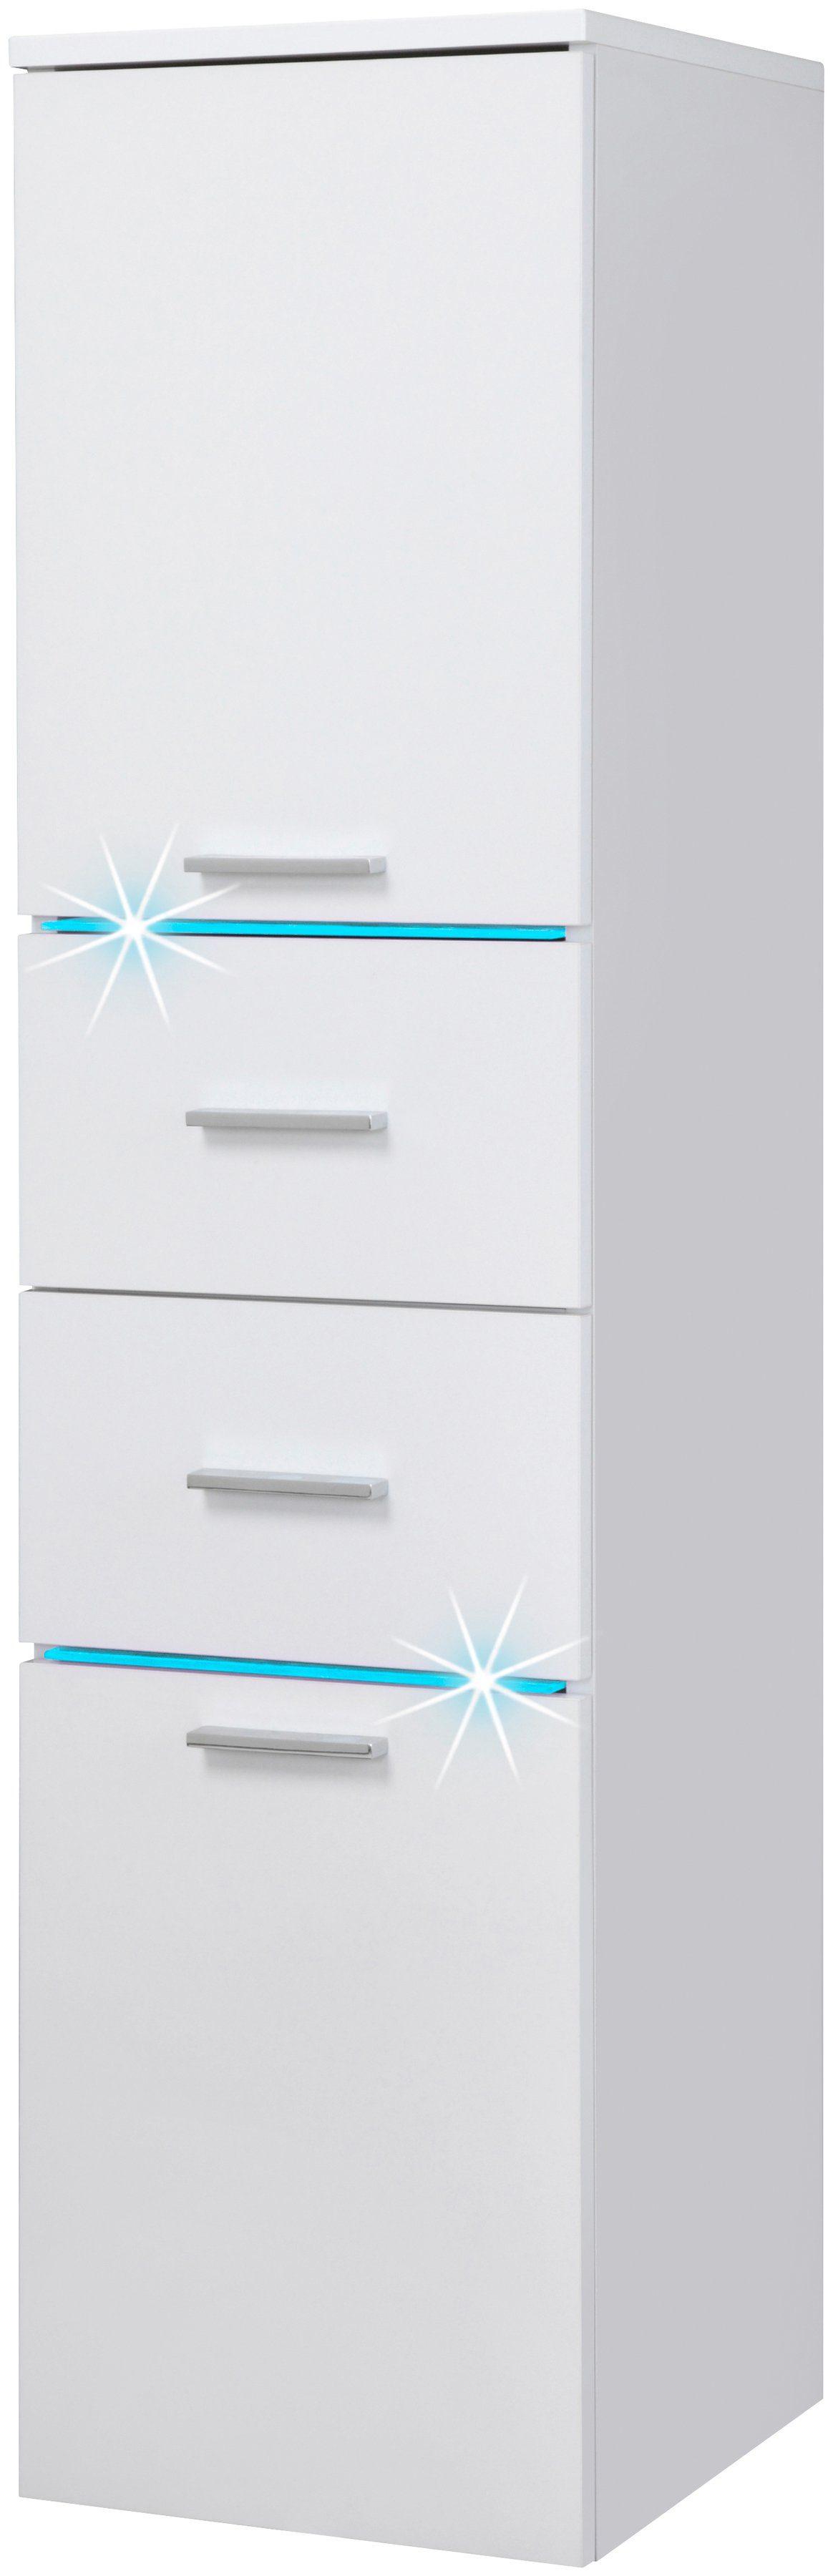 Schildmeyer Highboard »Polaris LED«, Breite 33 cm